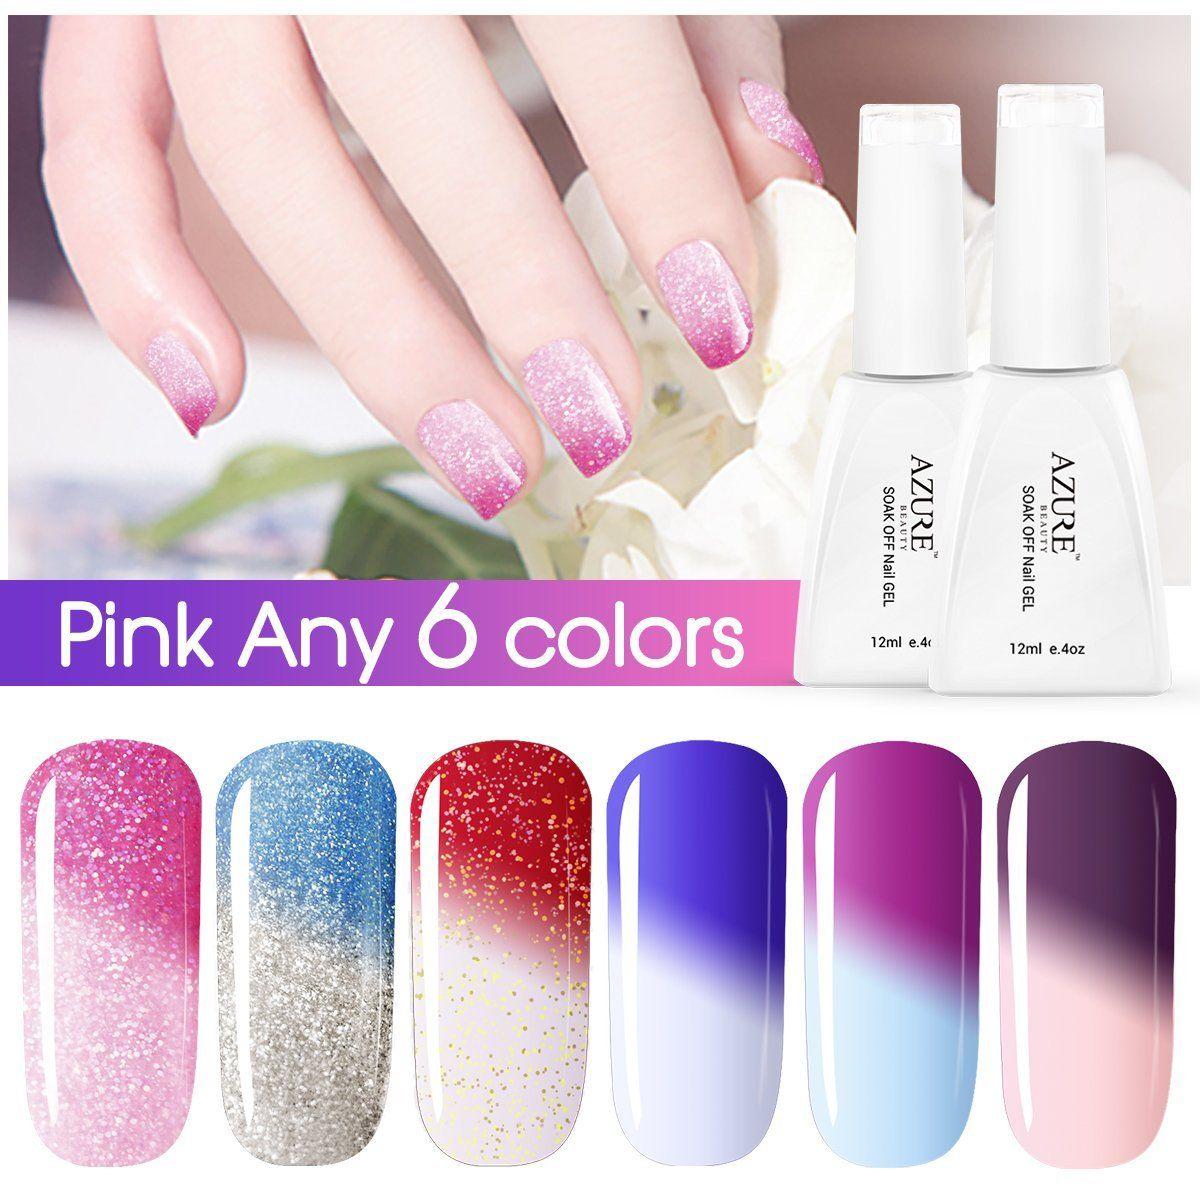 Azure Beauty Soak-off Chameleon Nail Polish UV LED Gel Pick Any 6 ...